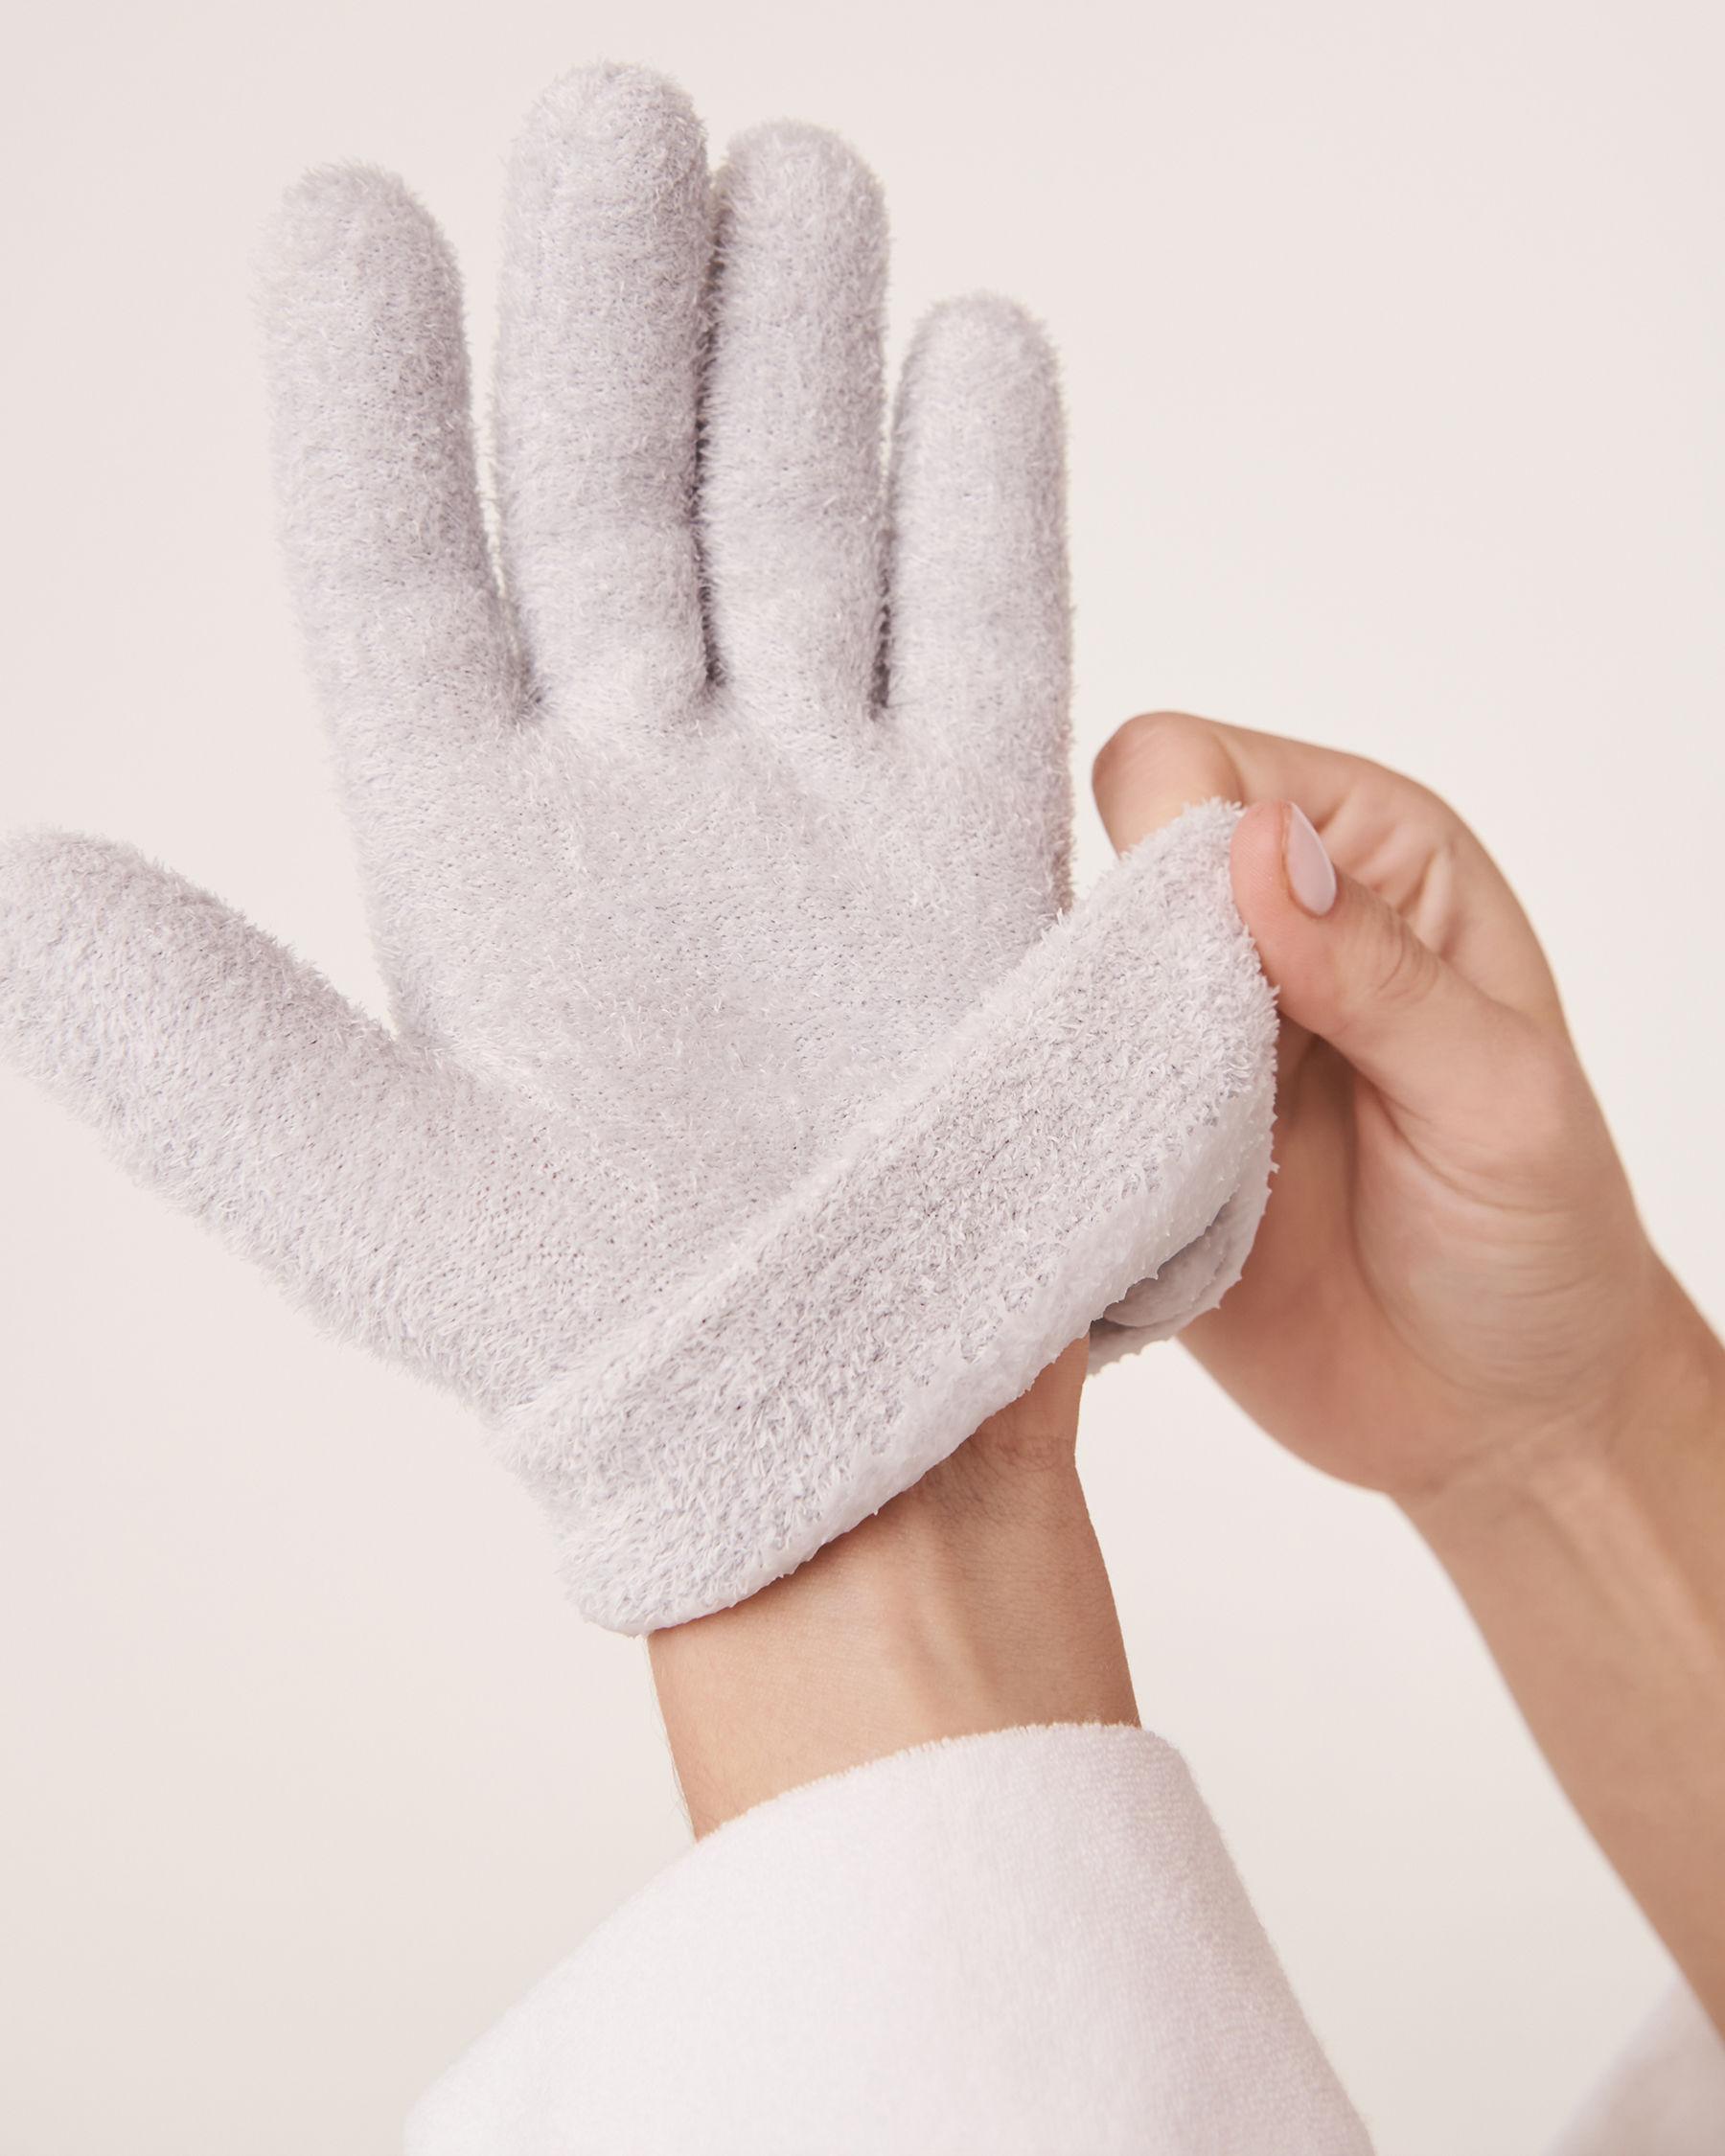 LA VIE EN ROSE Lavender Moisturizing Gel Gloves Grey 431-527-1-00 - View1